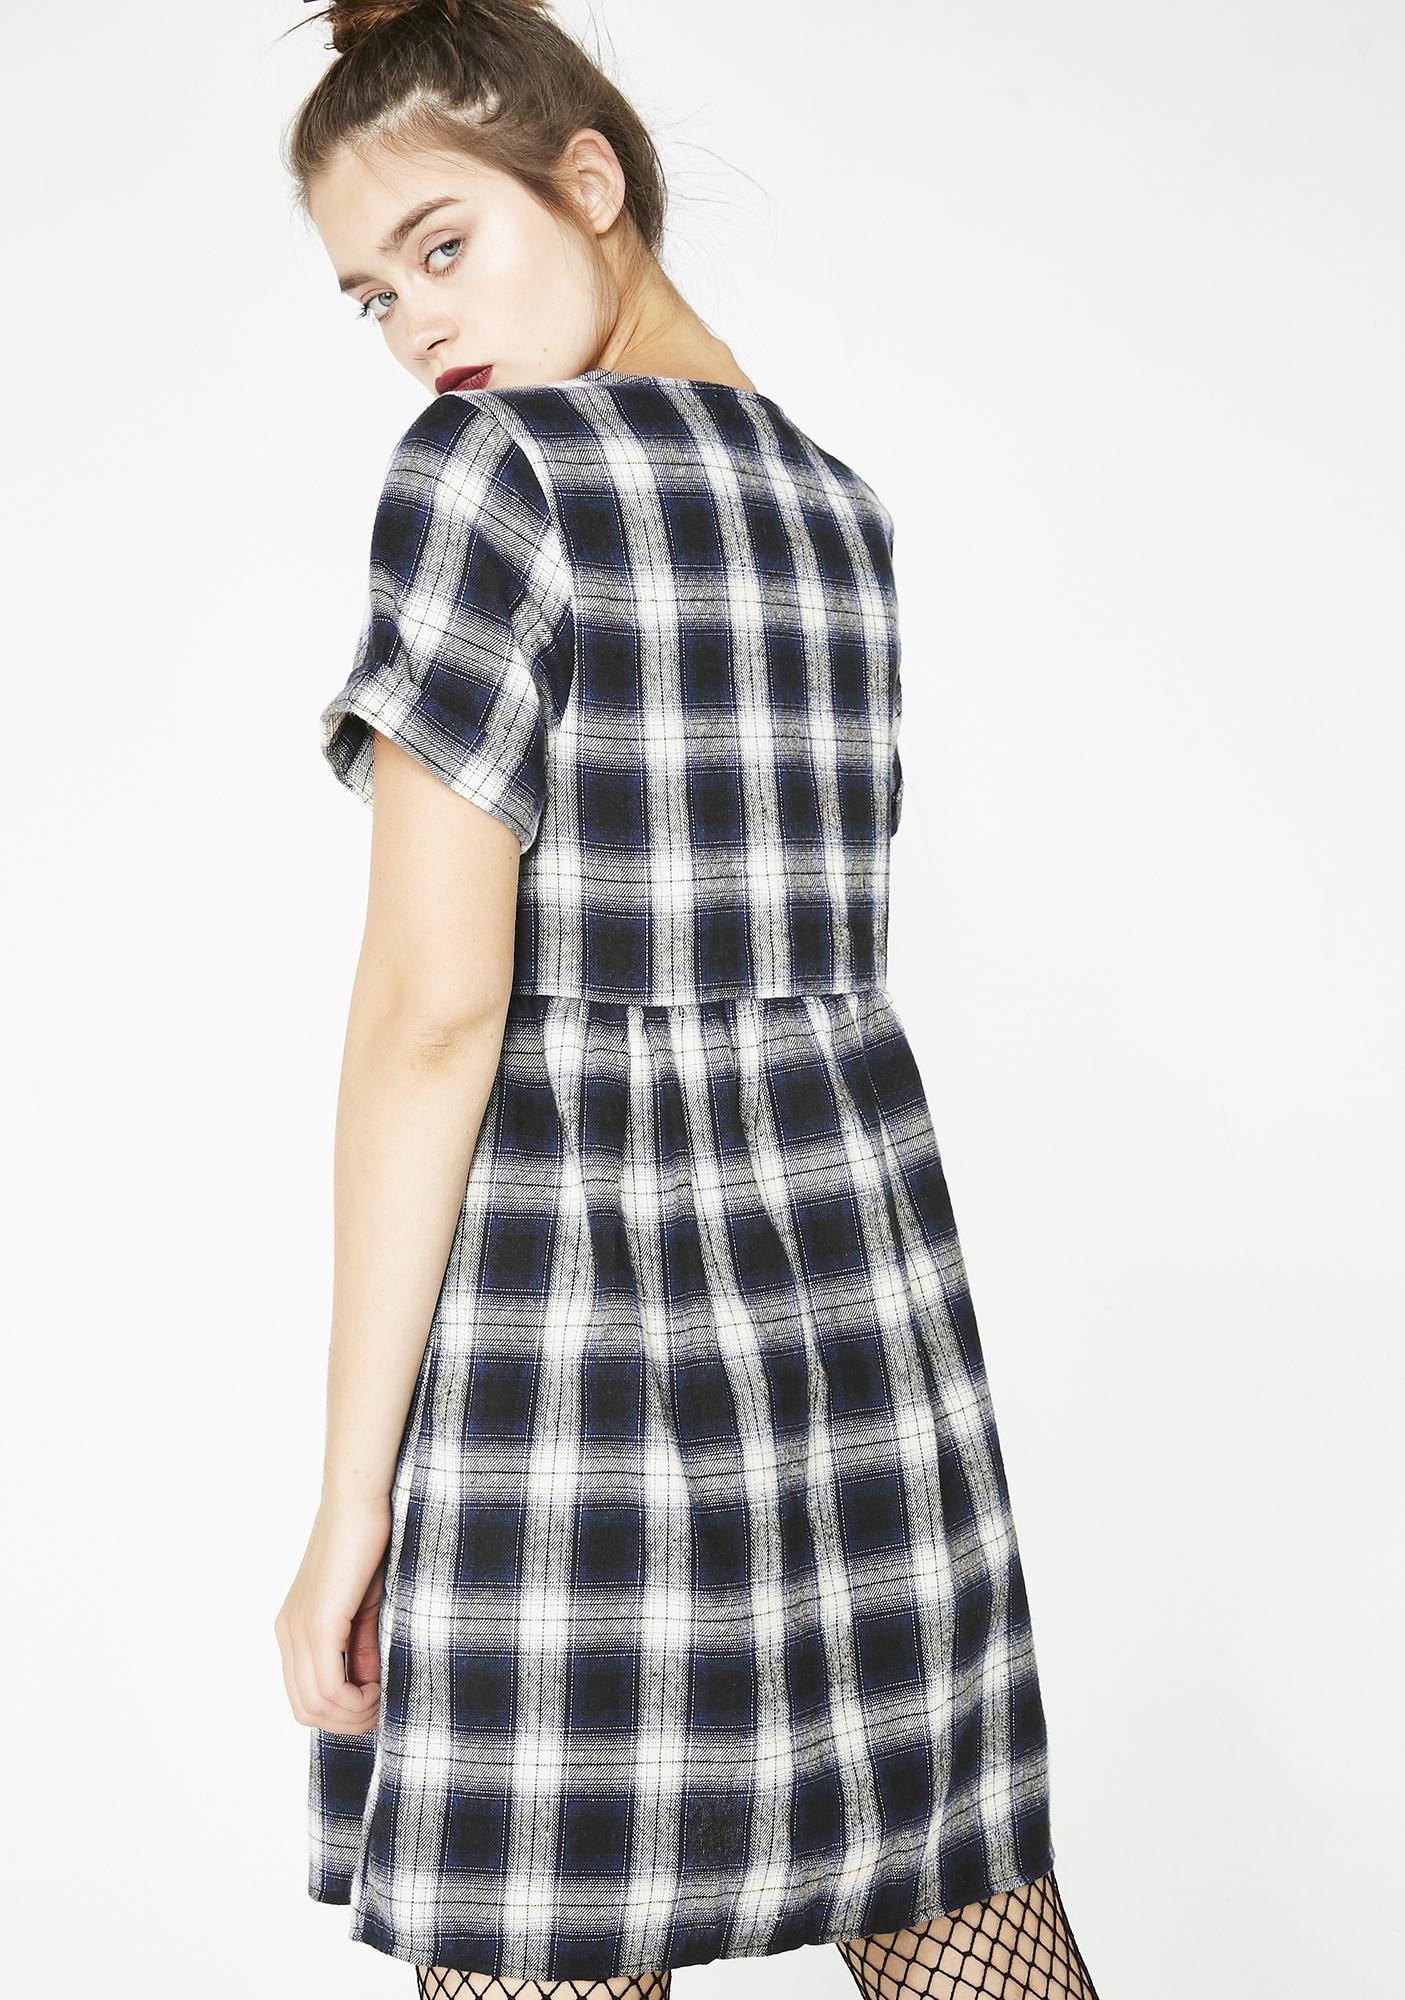 526bcb53f33 ... Plaid First Time Babydoll Dress ...